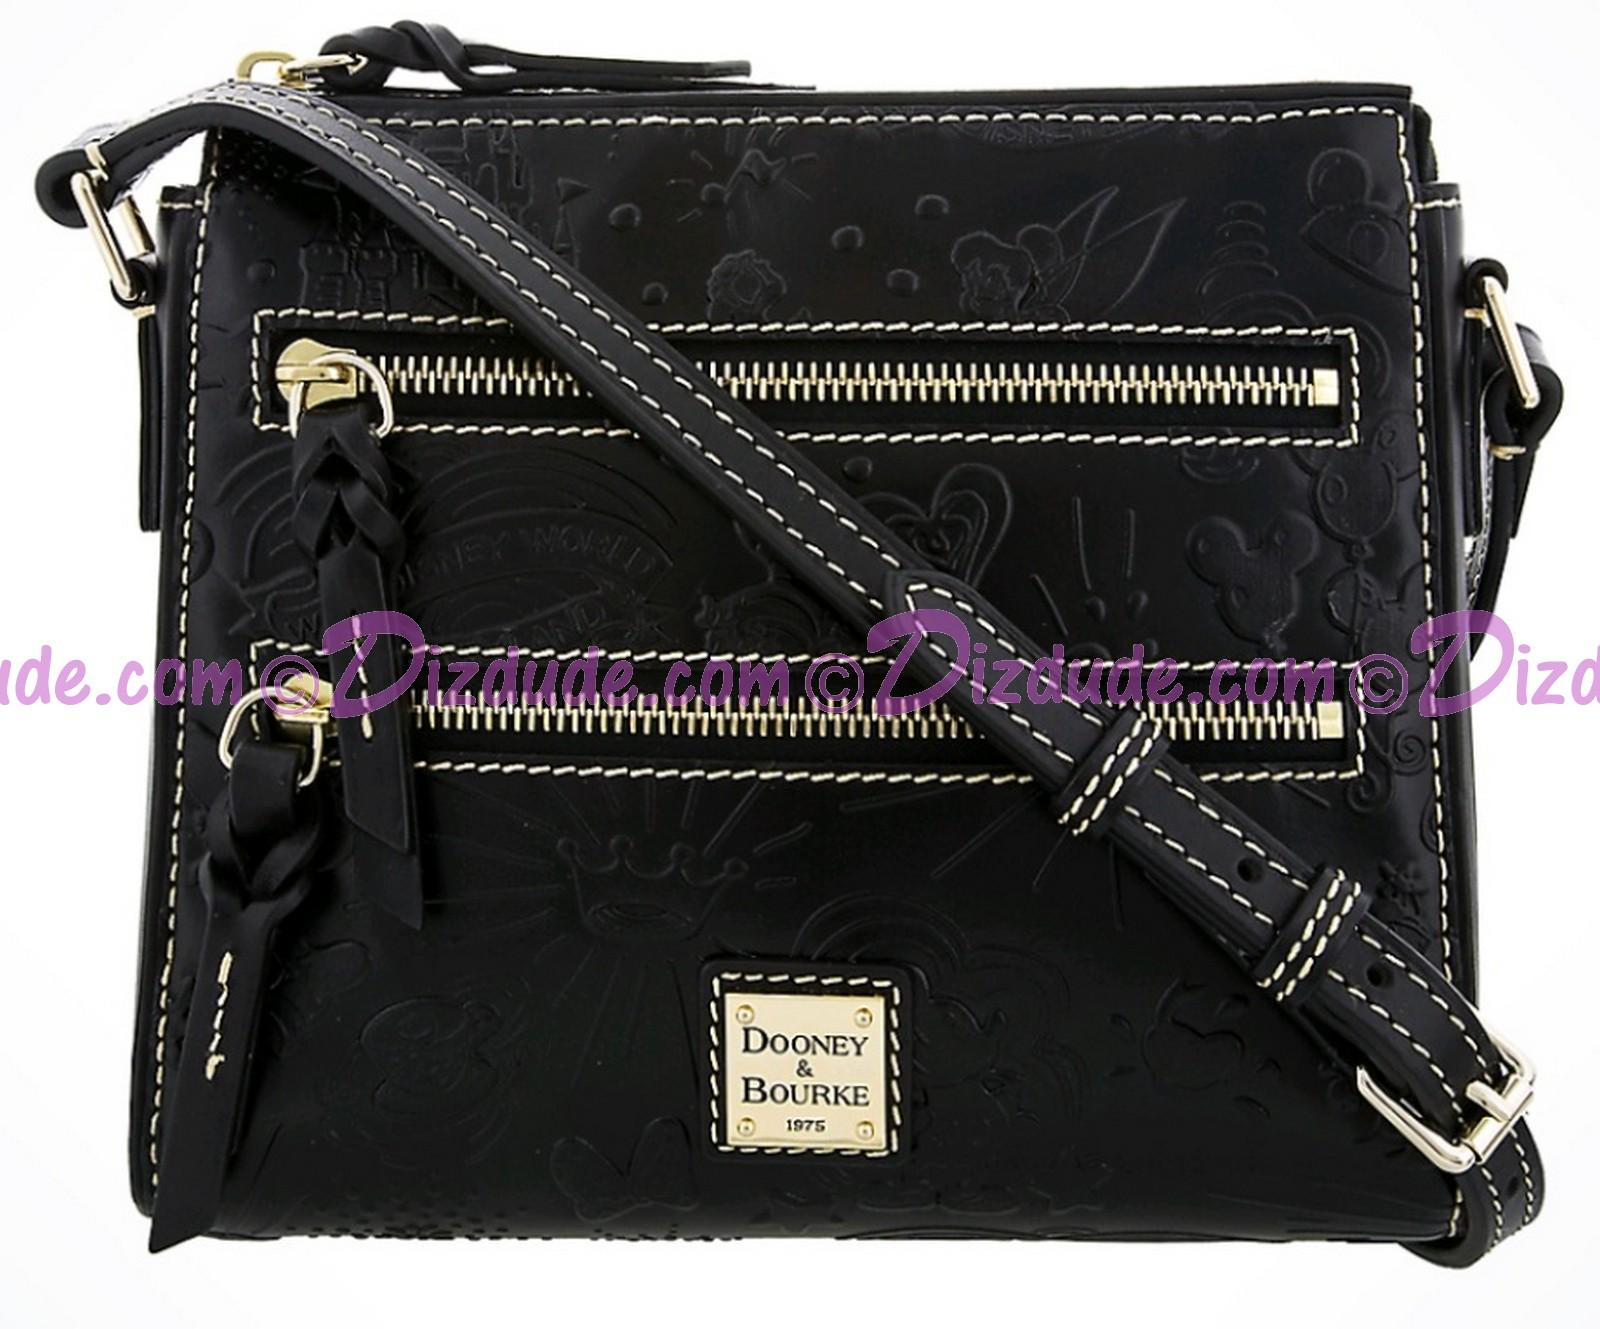 Dooney & Bourke Black Leather Sketch Slim Cross Body Bag - Disney World Exclusive © Dizdude.com